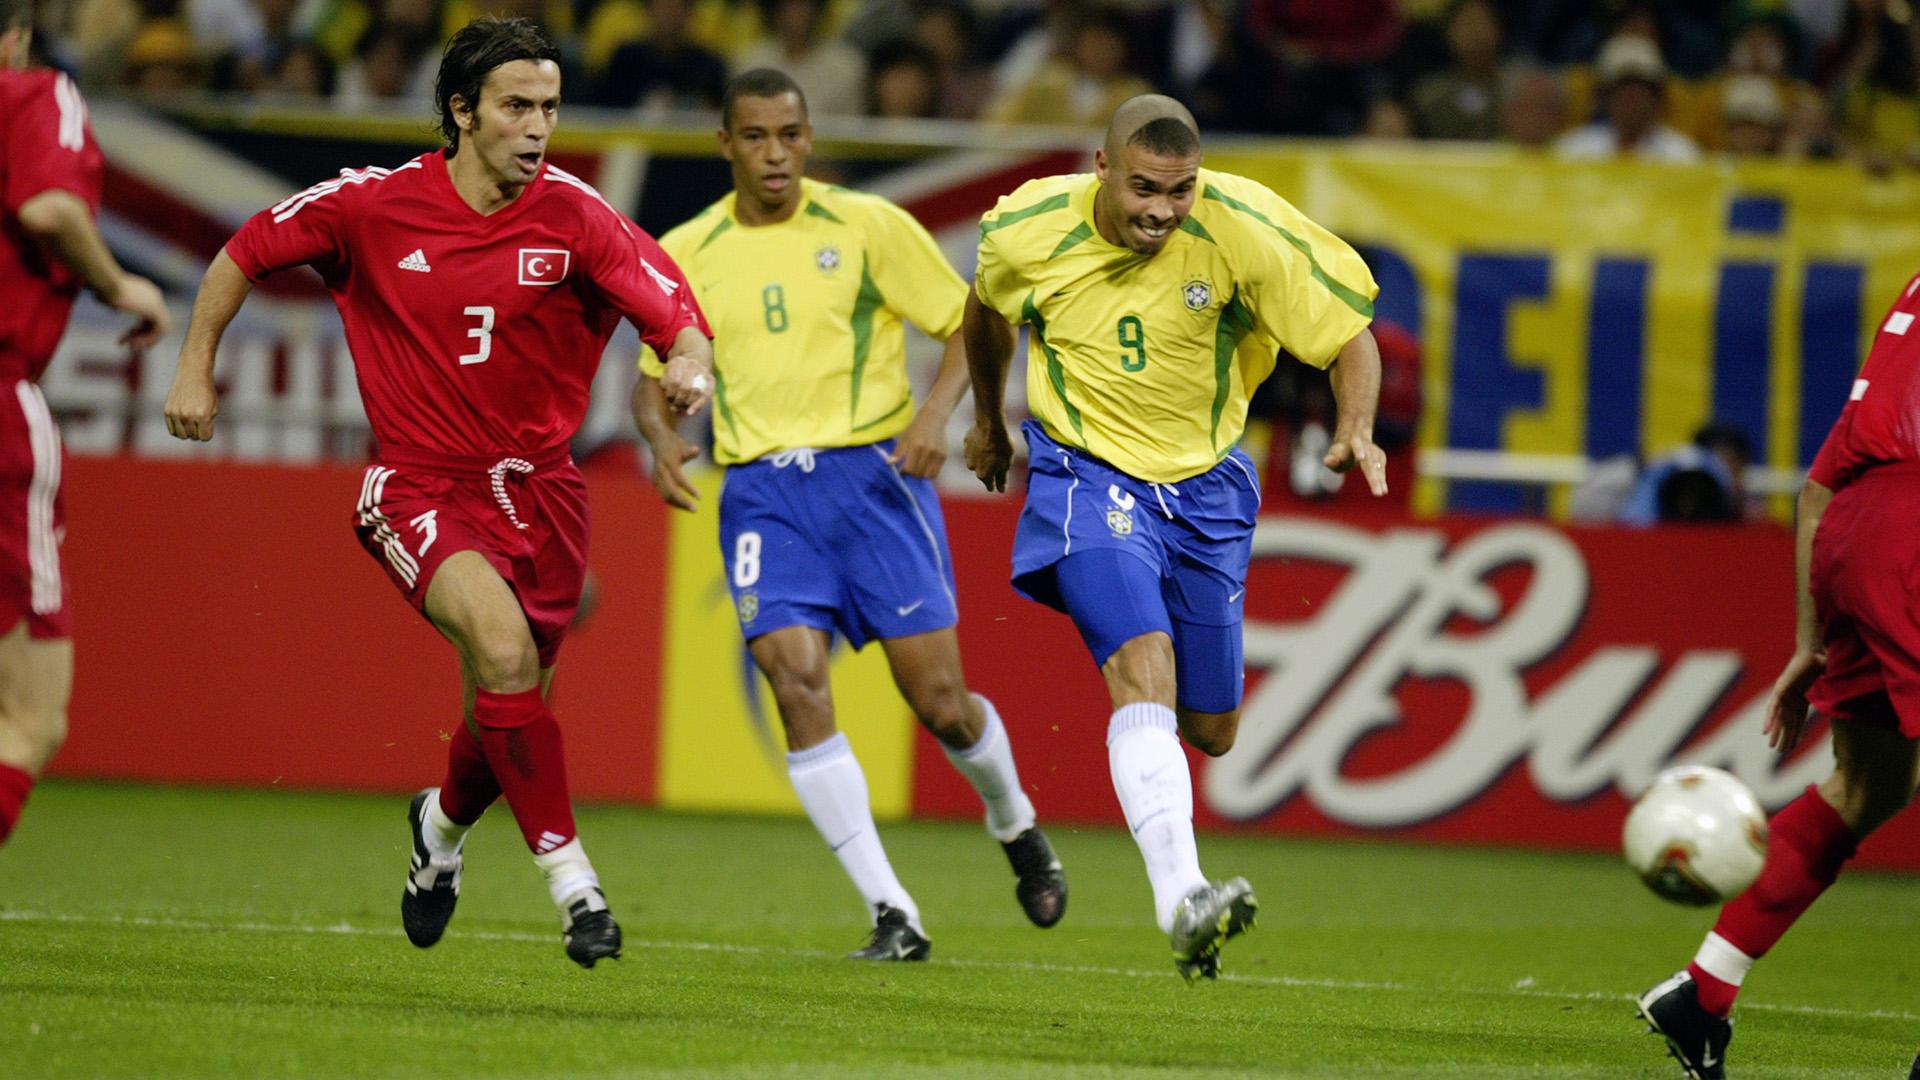 Ronaldo Nazario Brazil Turkey 2002 World Cup semifinals 26062002